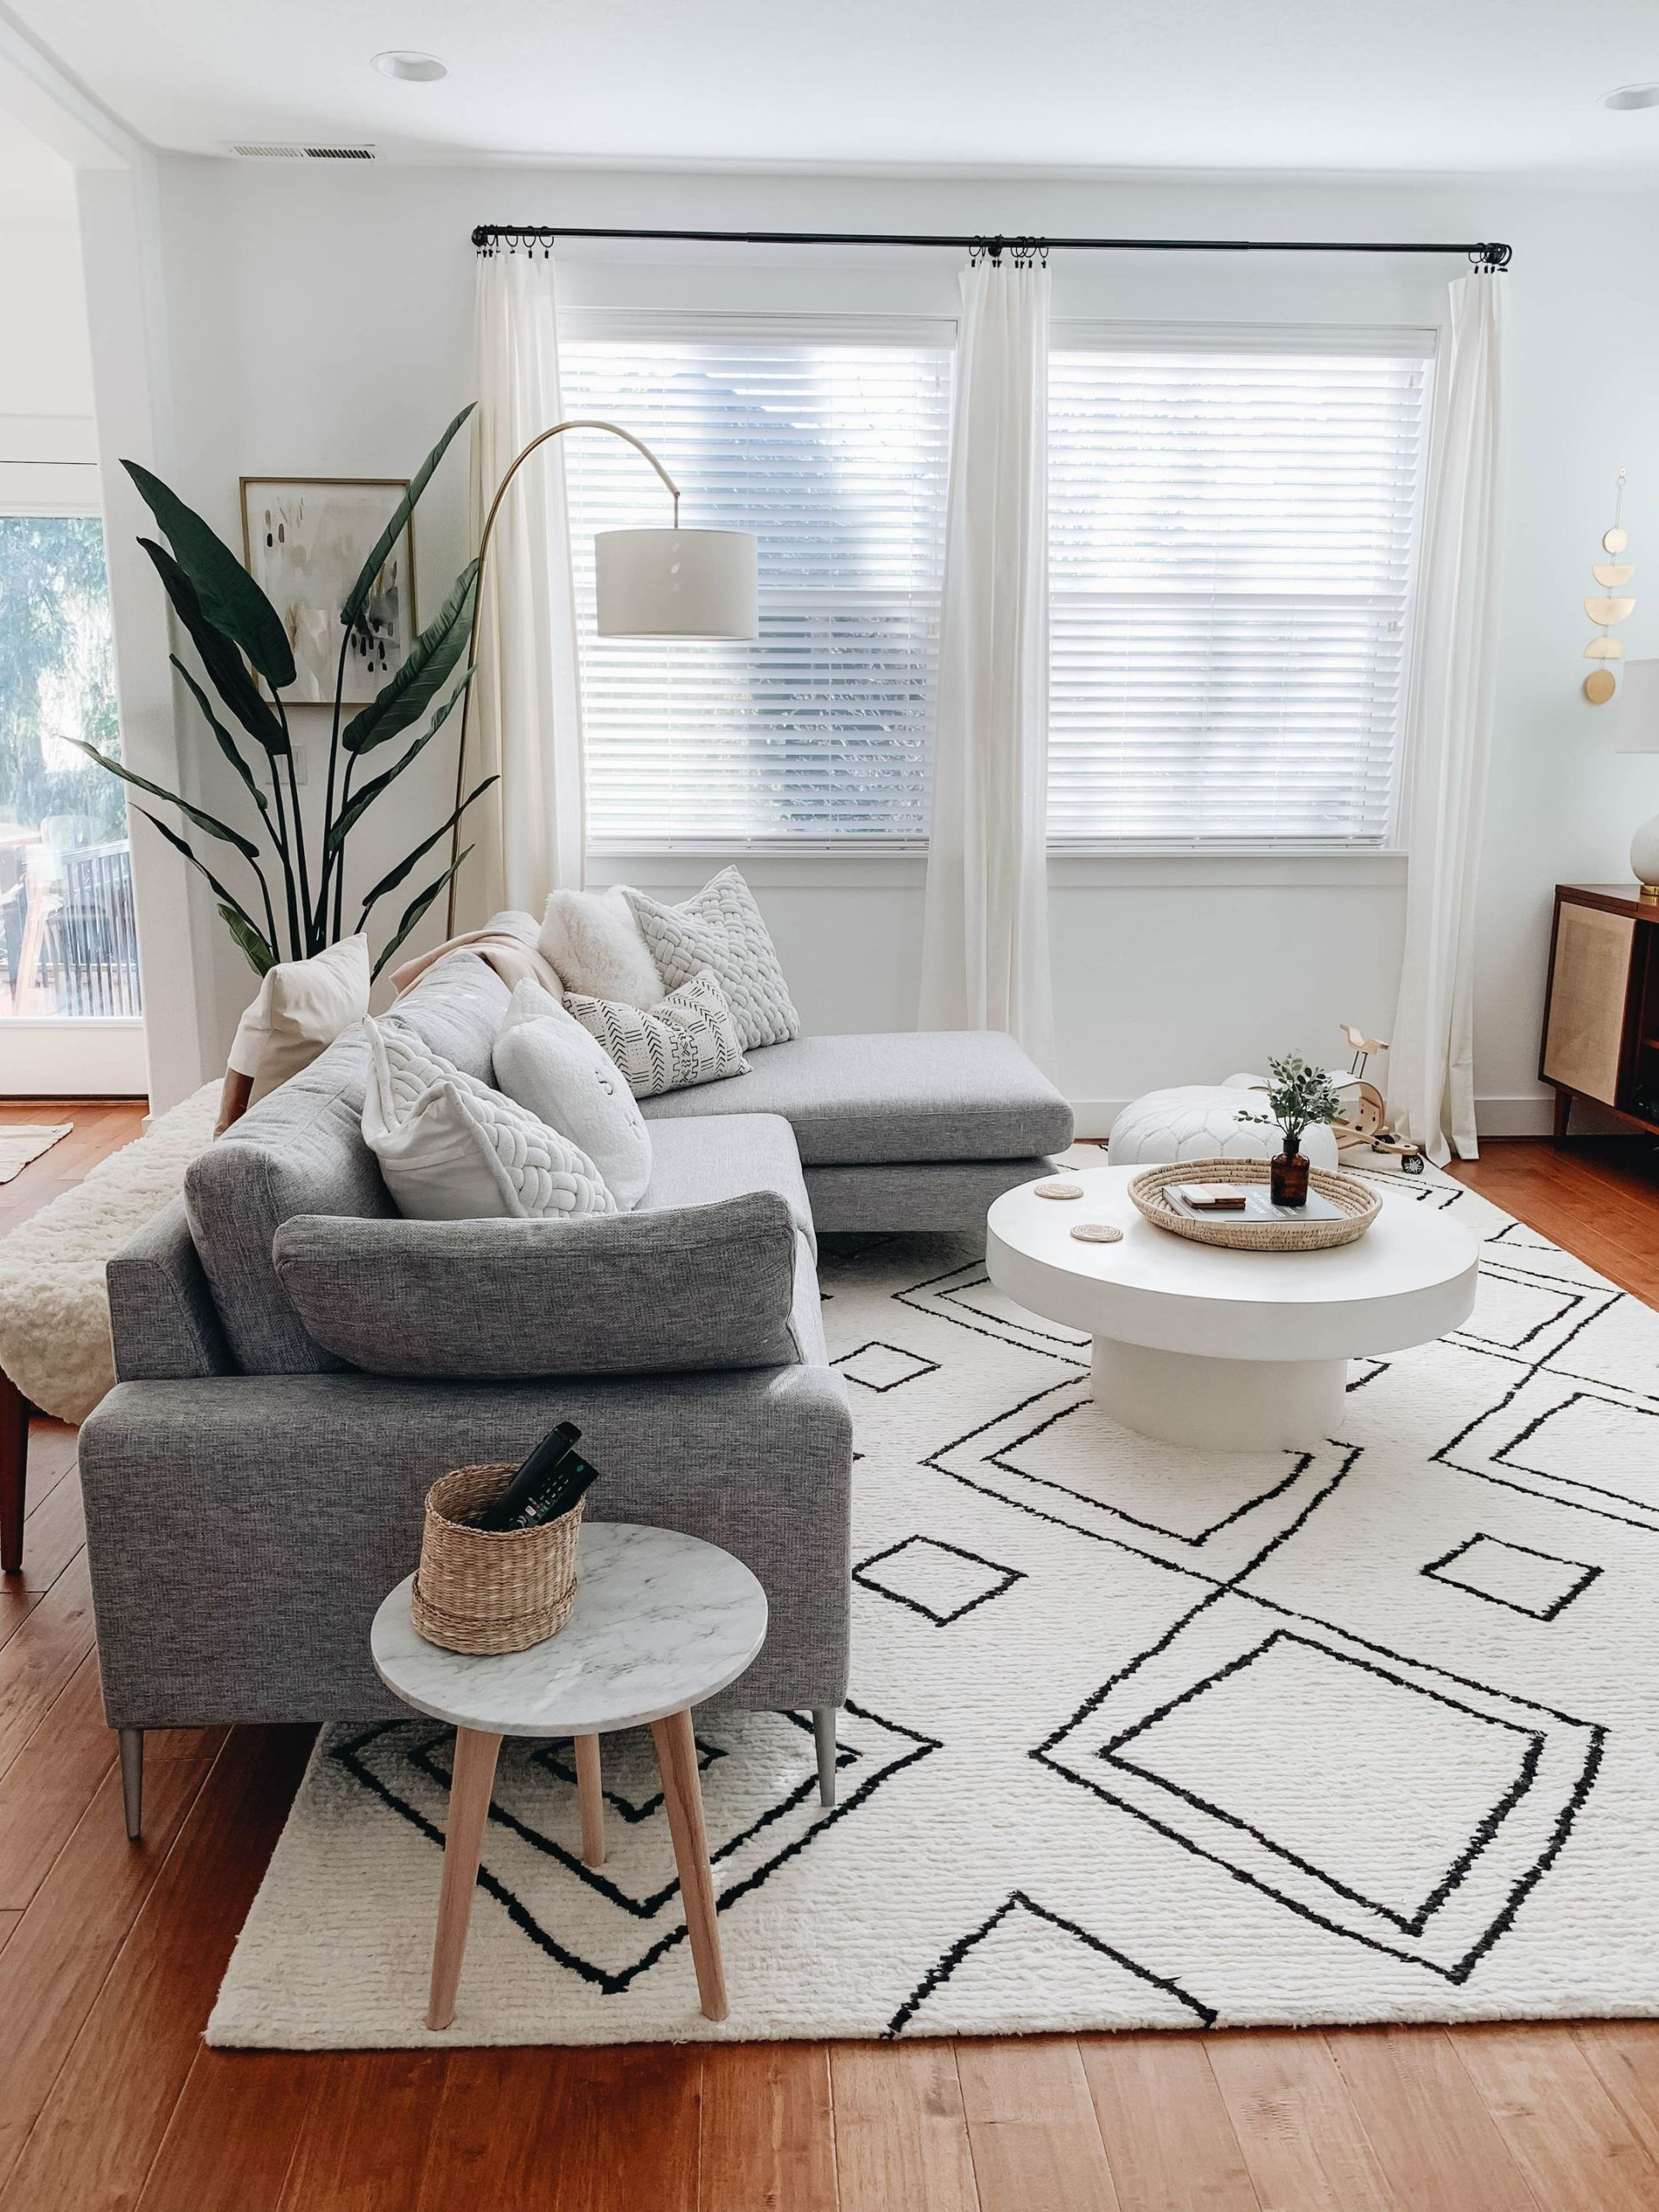 Steep Furniture Living Room Chairs #furniturecafe #FurnitureLivingRoomContempora… – Decor Love Time 2020